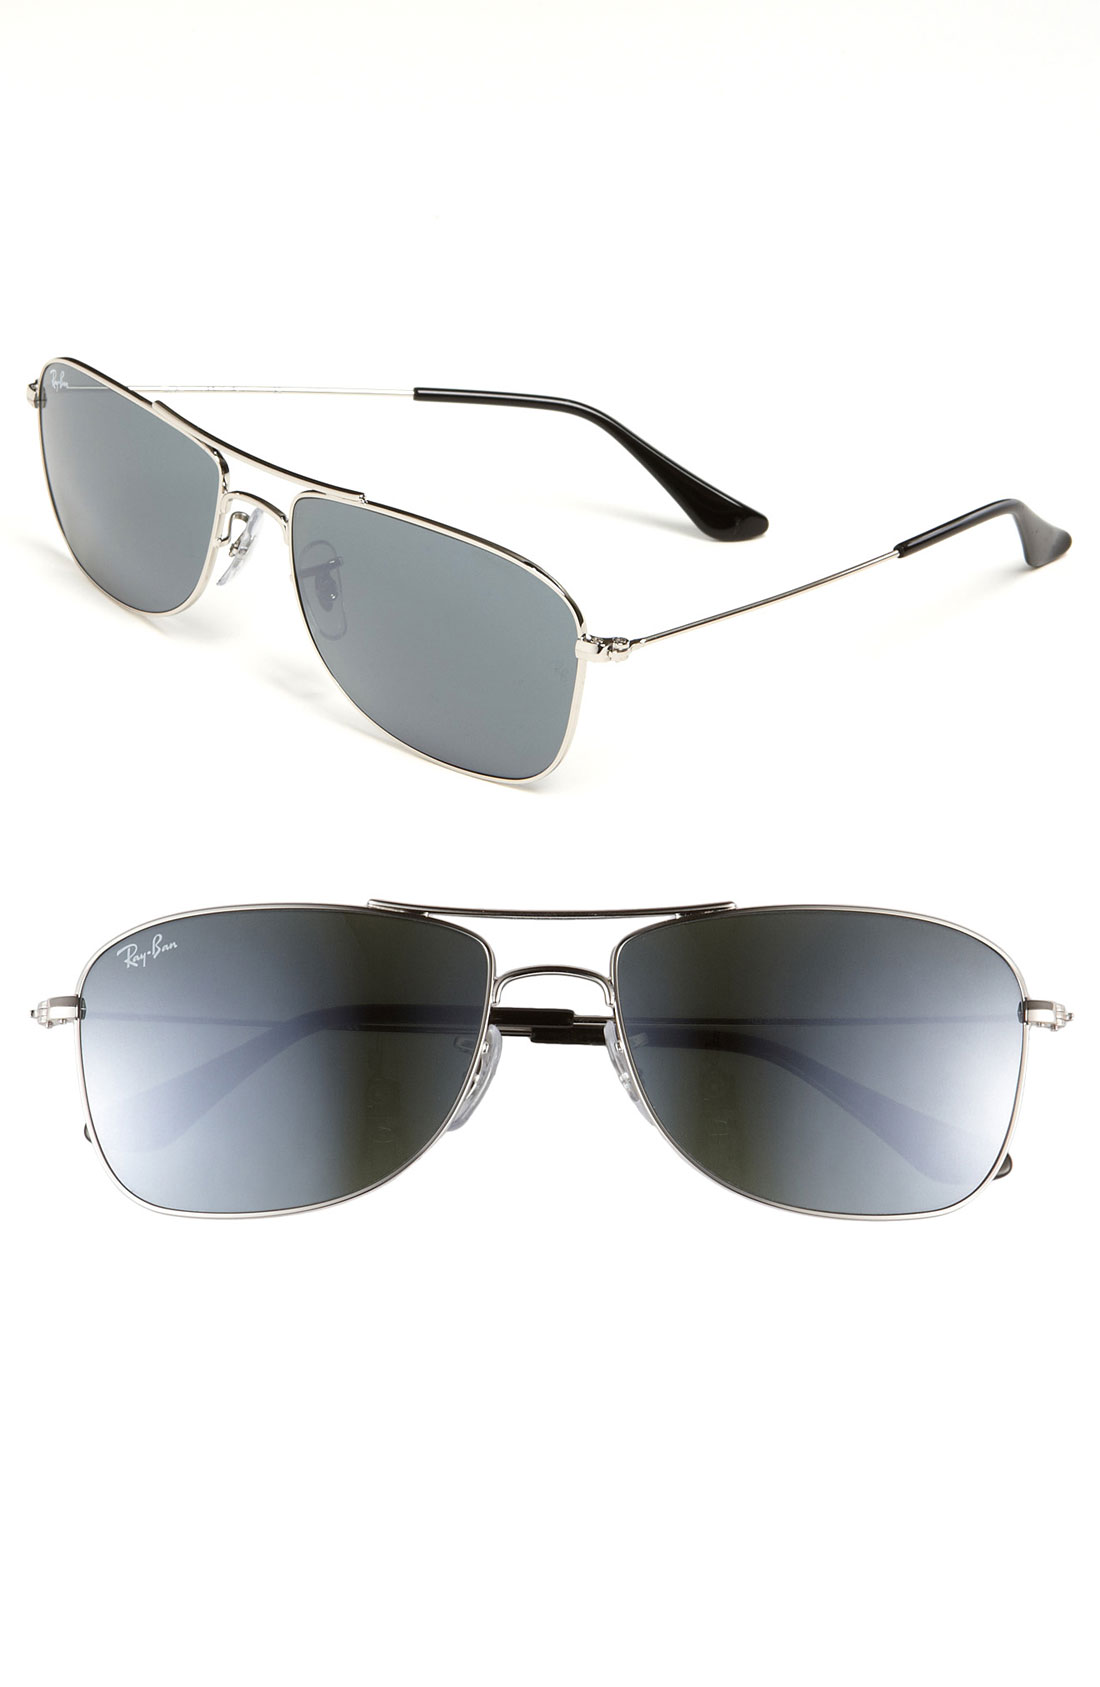 Mirrored ray ban aviator louisiana bucket brigade for Mirror sunglasses